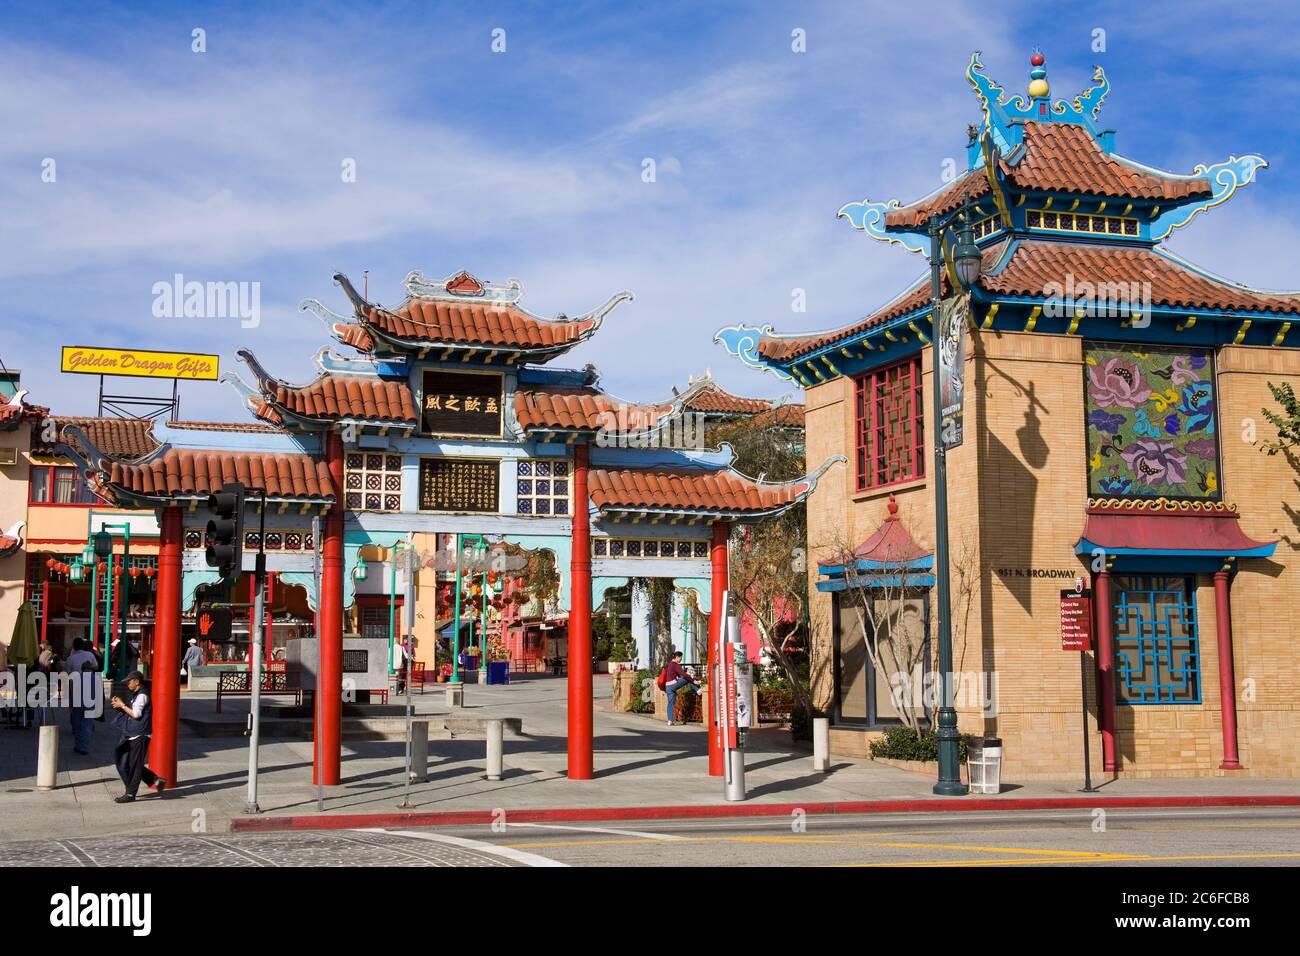 Golden dragon chinatown ukiah topaz golden dragon